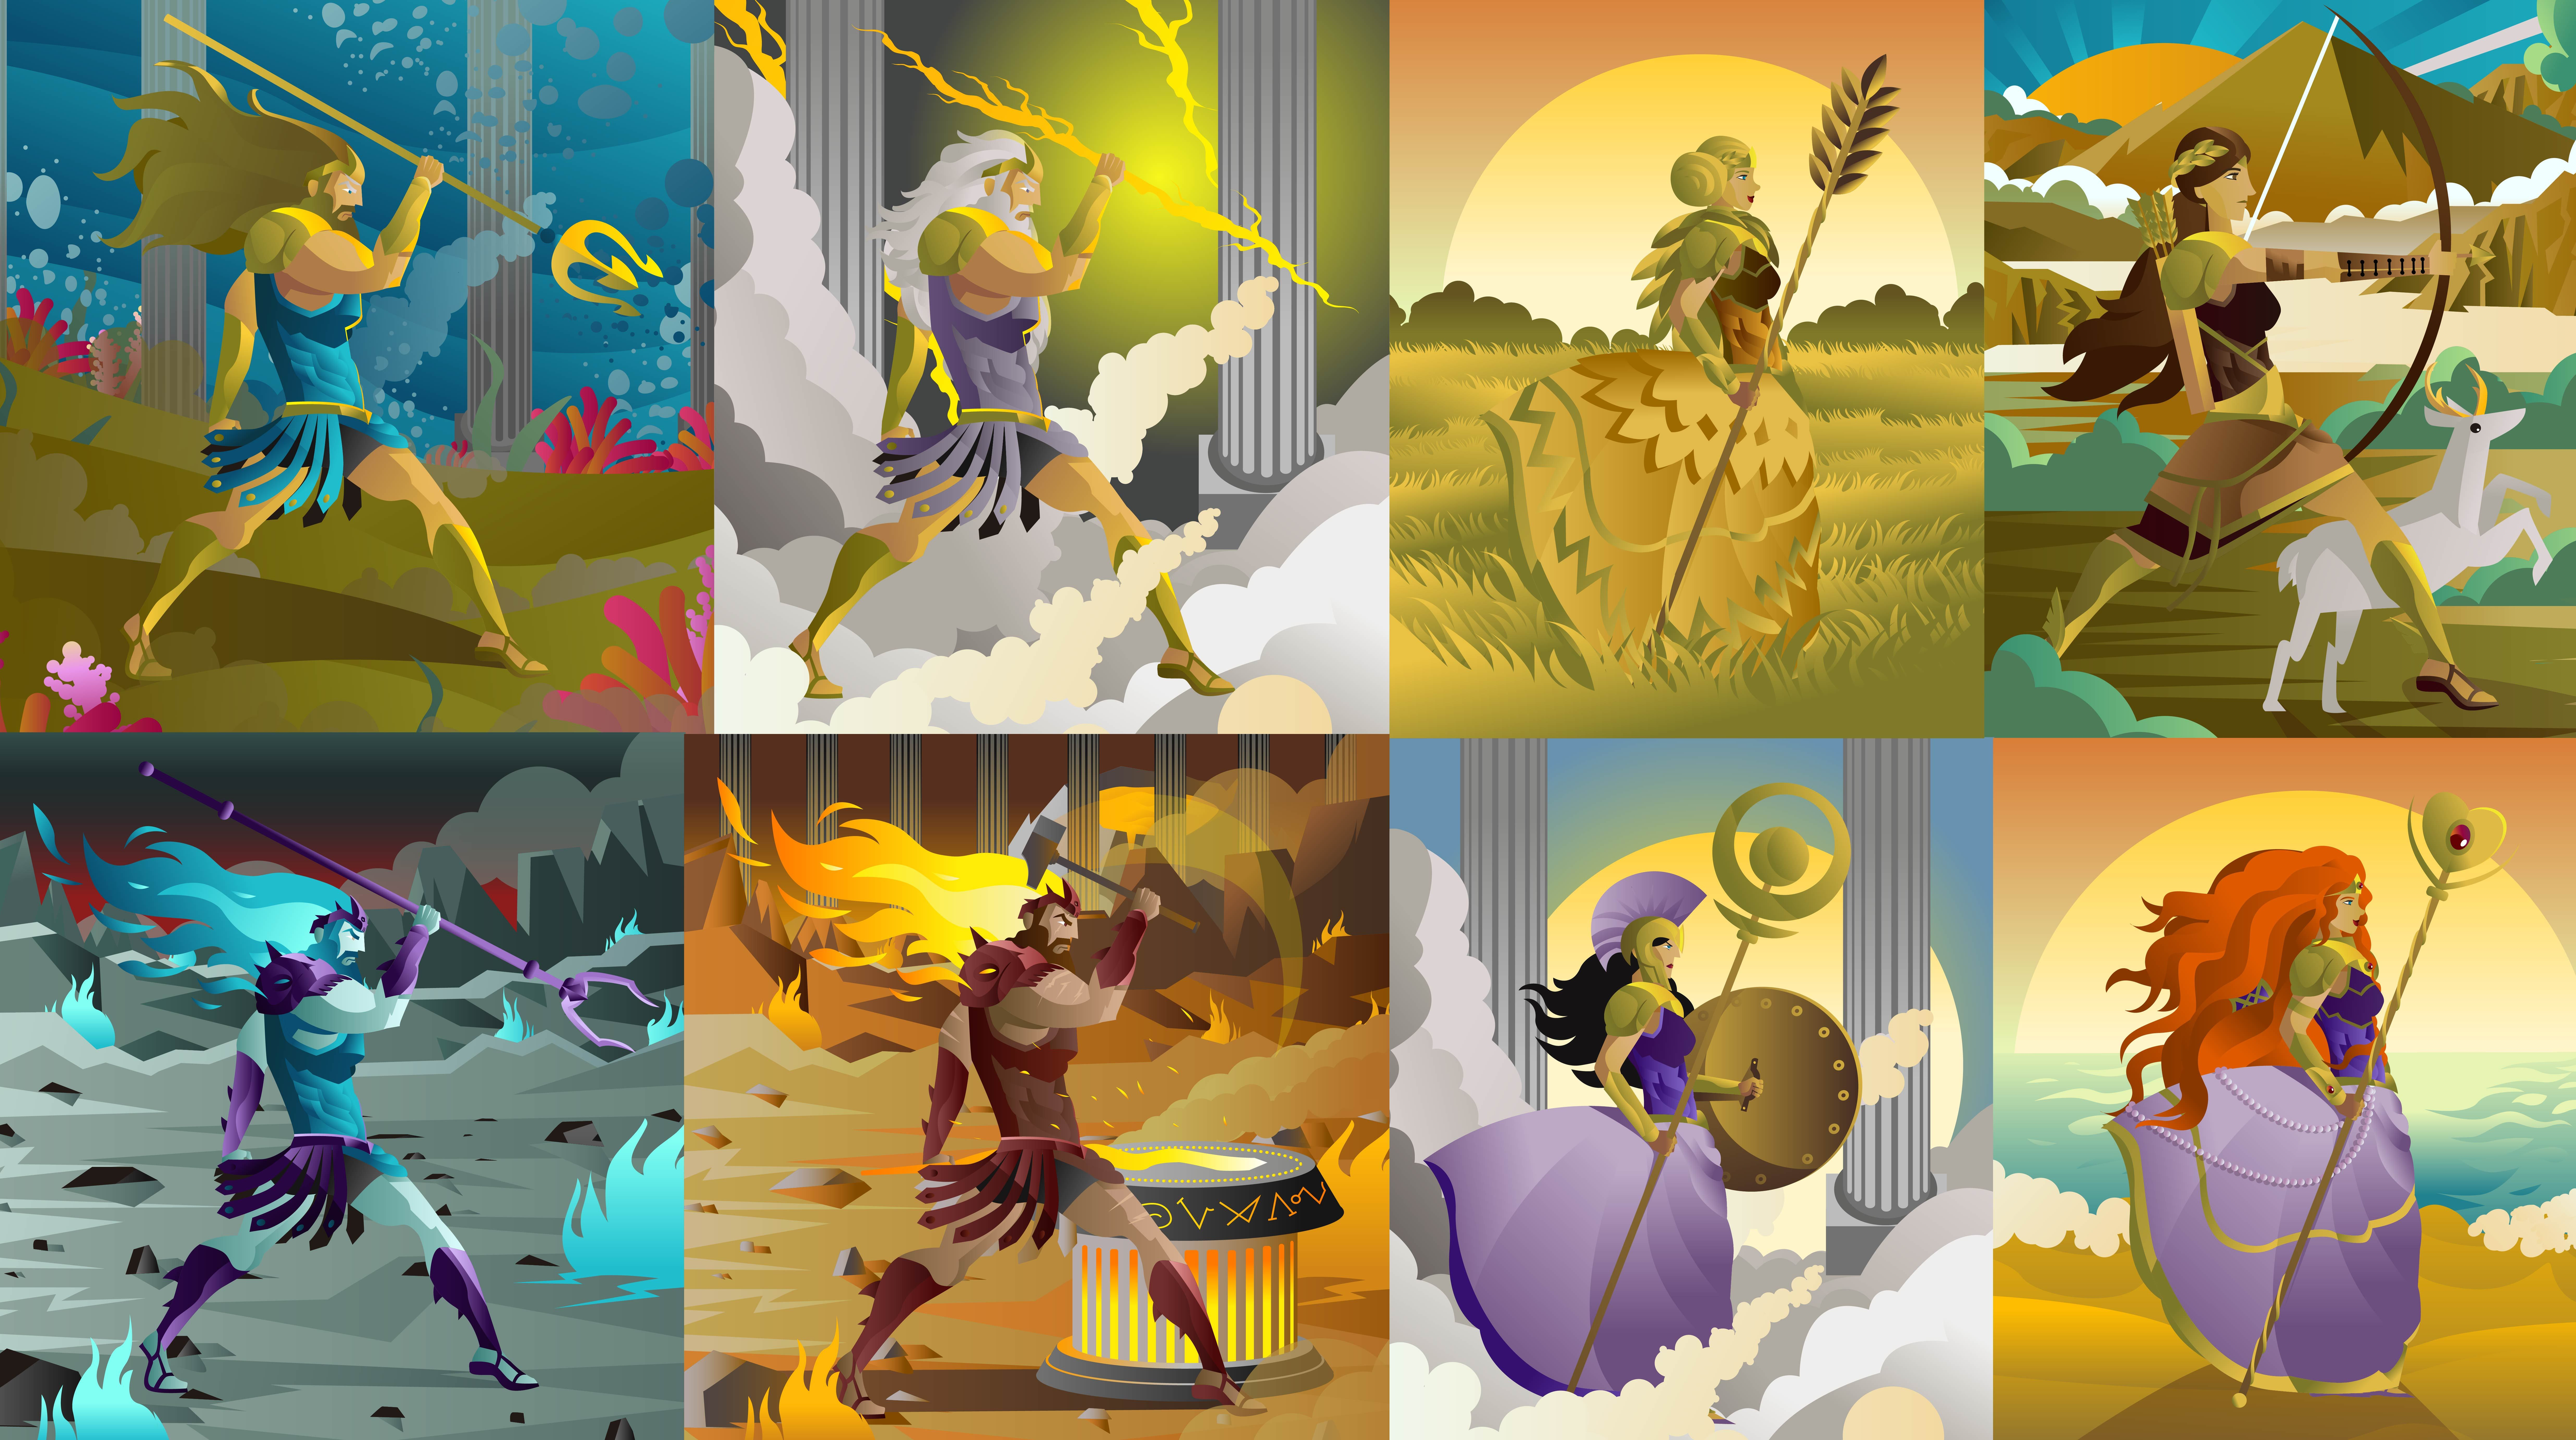 Archetypal gods